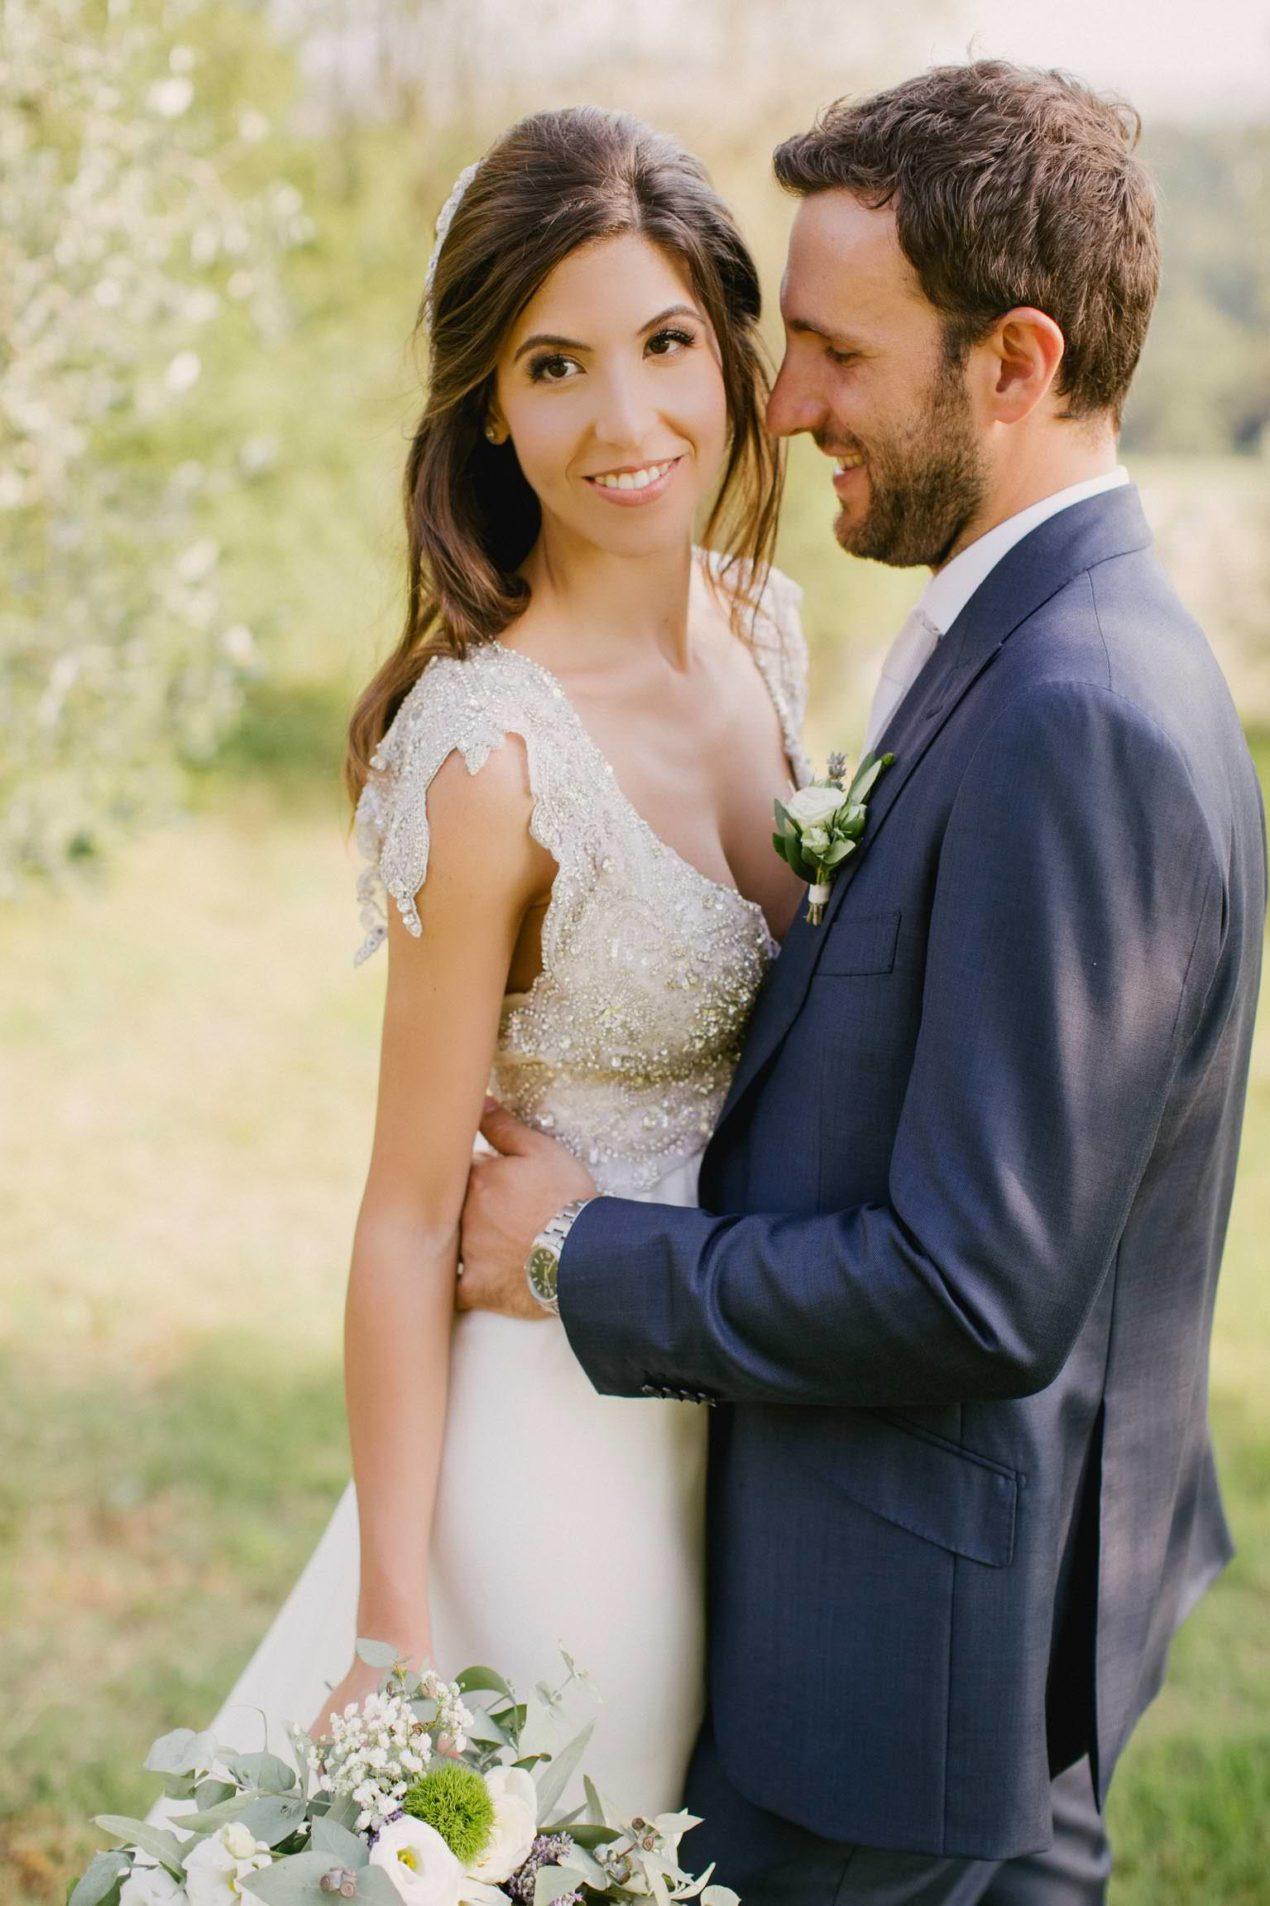 matrimonio-pienza-050-635x953@2x.jpg